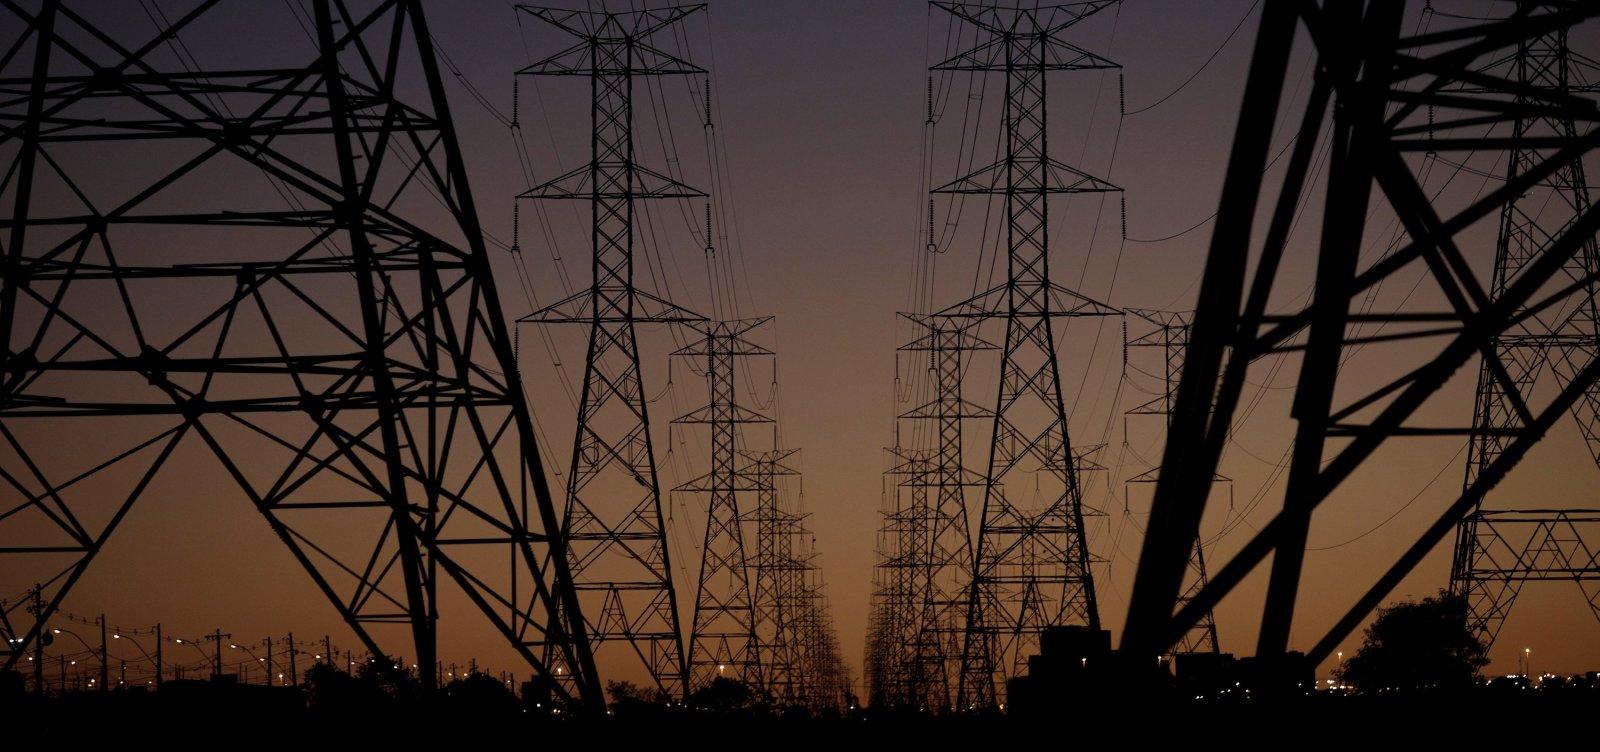 Roraima suspende uso de energia da Venezuela após apagões no estado